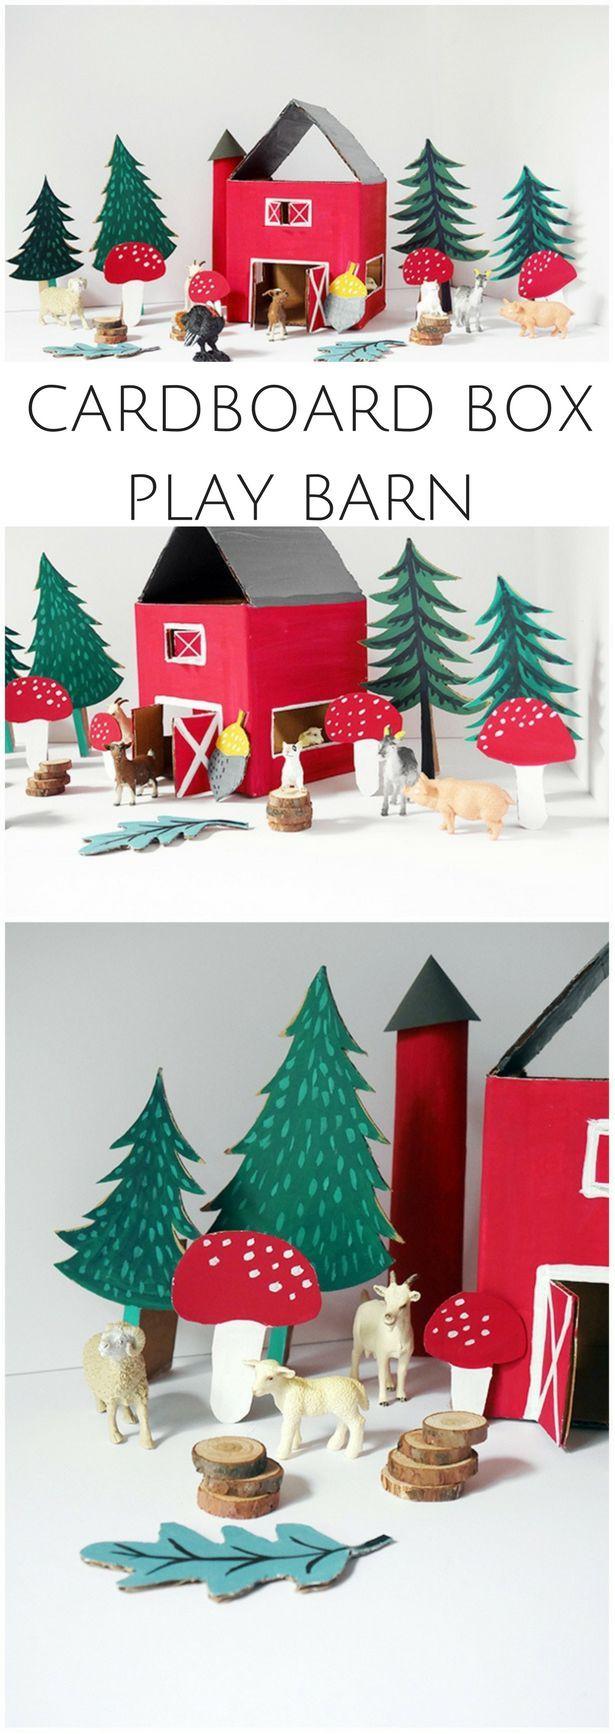 DIY Recycled Cardboard Box Play Barn Create